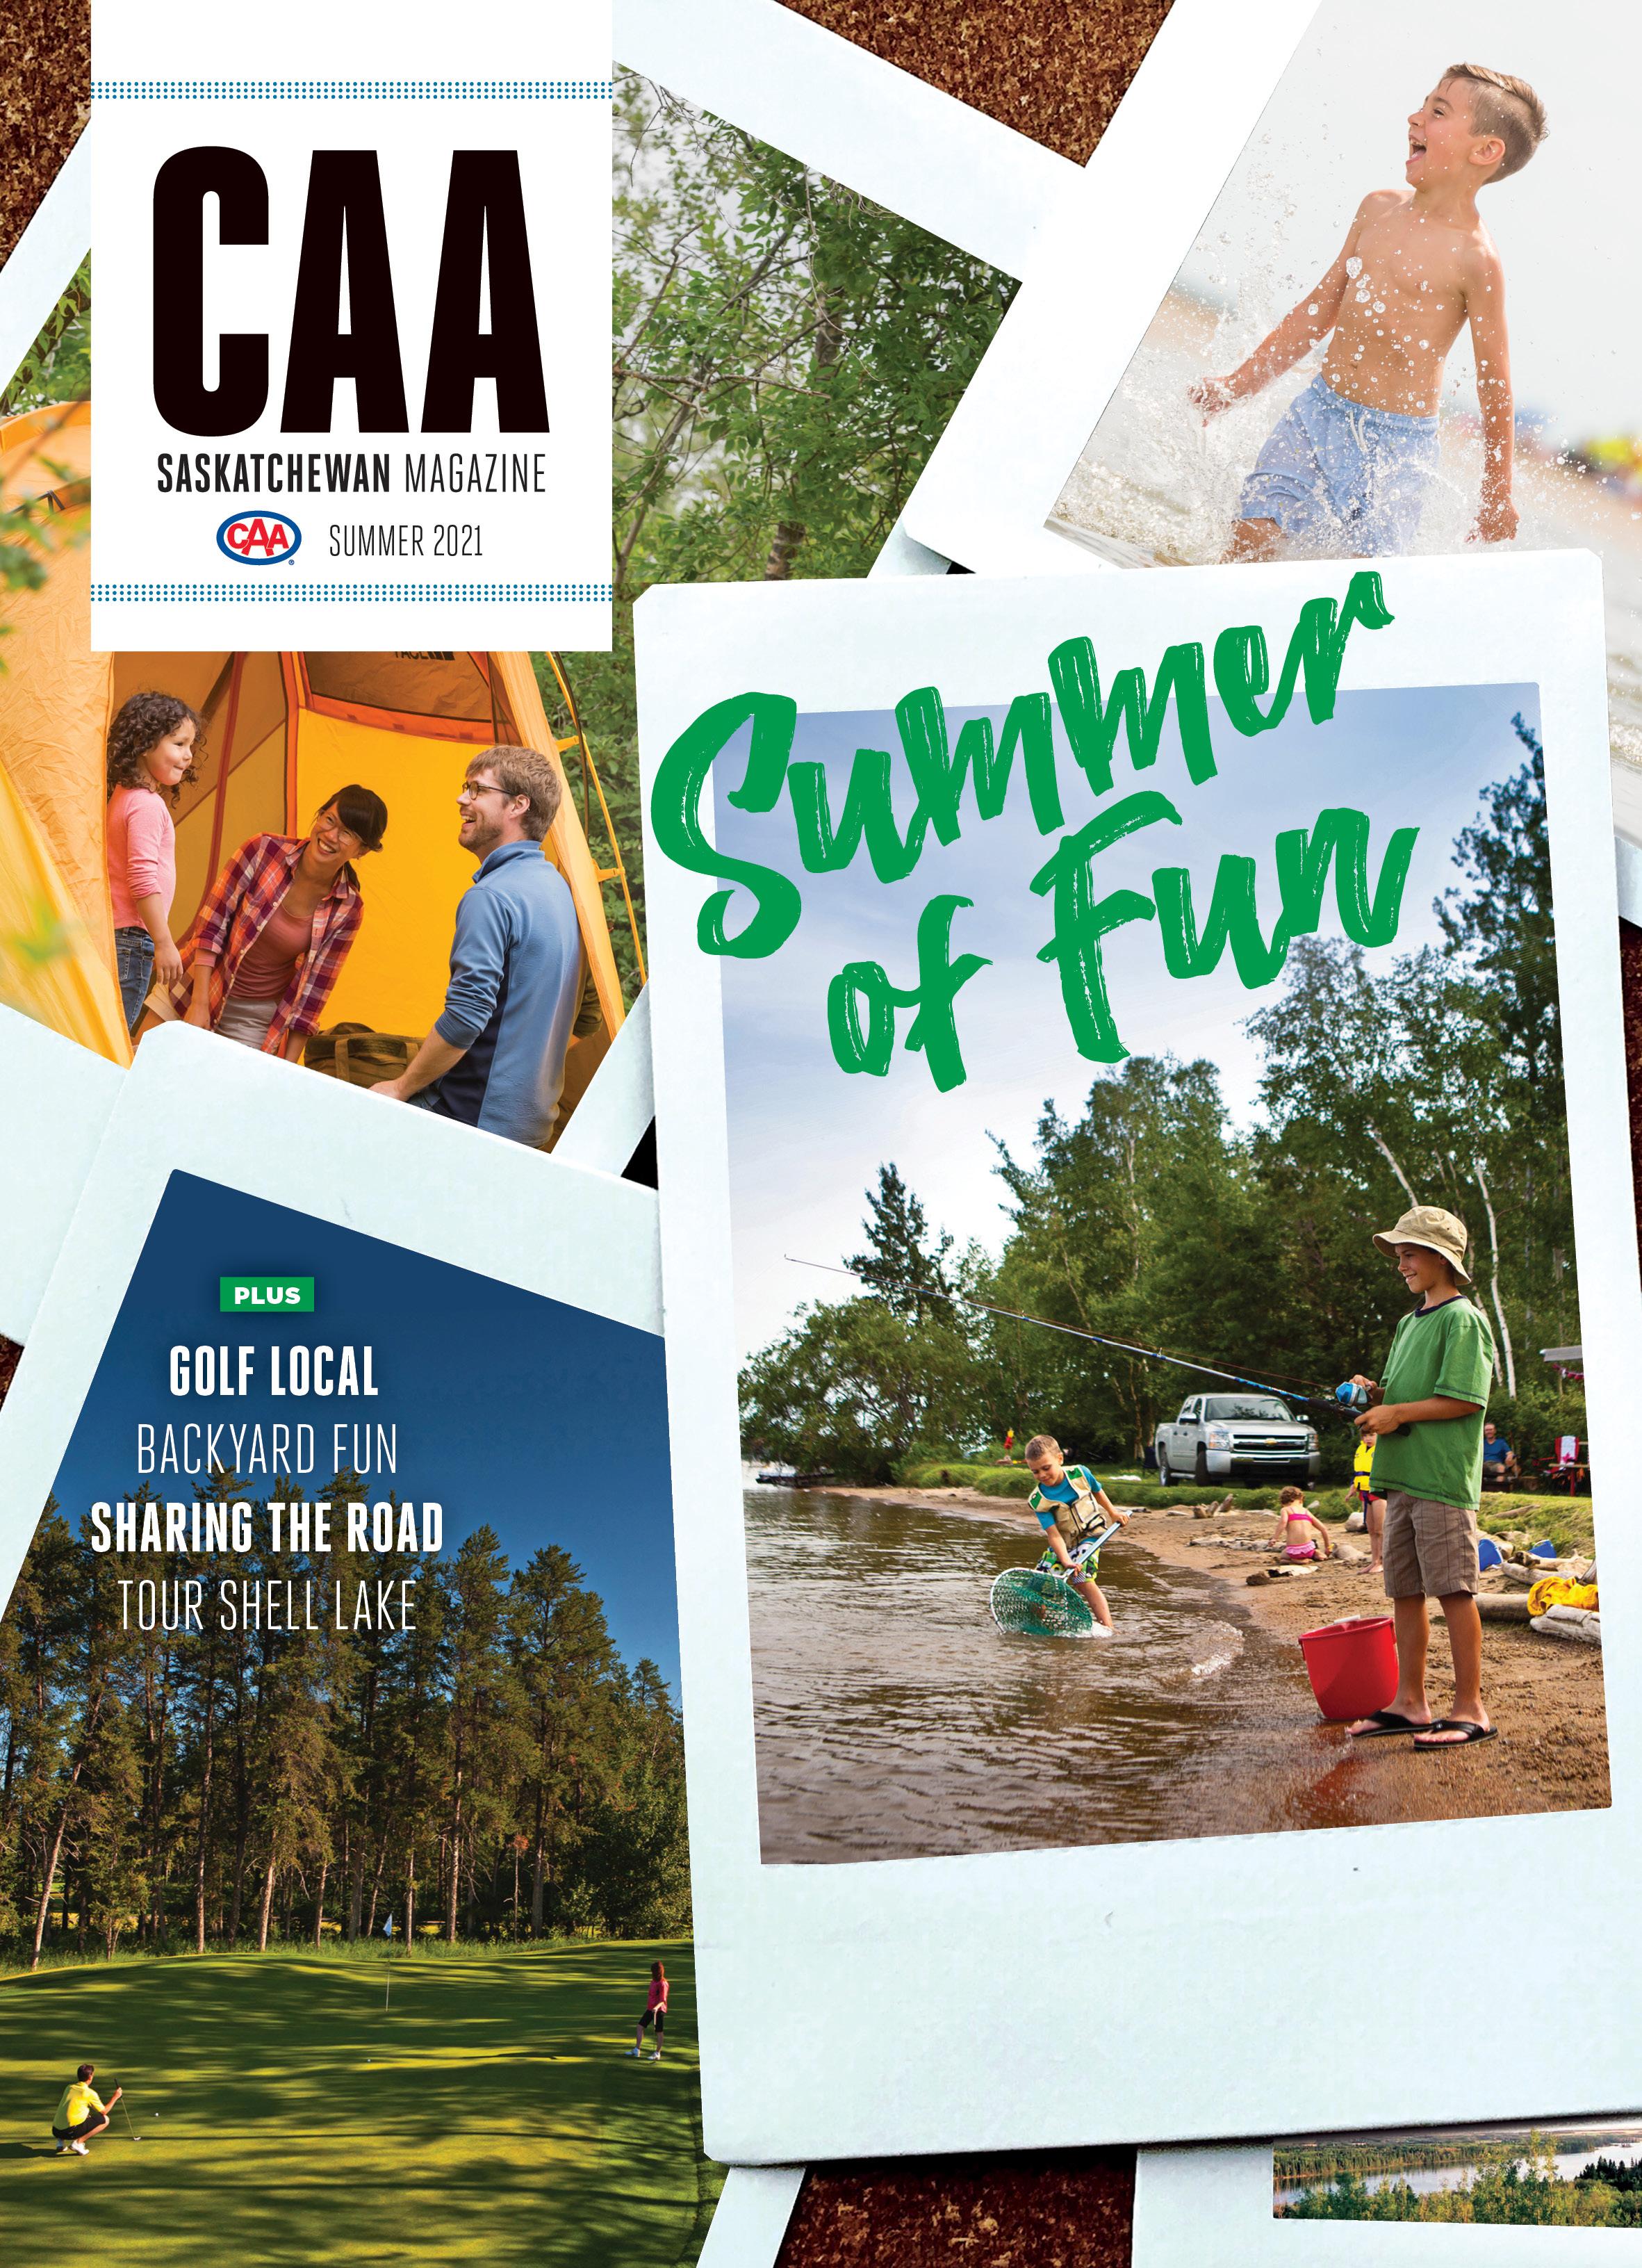 CAA Saskatchewan Magazine